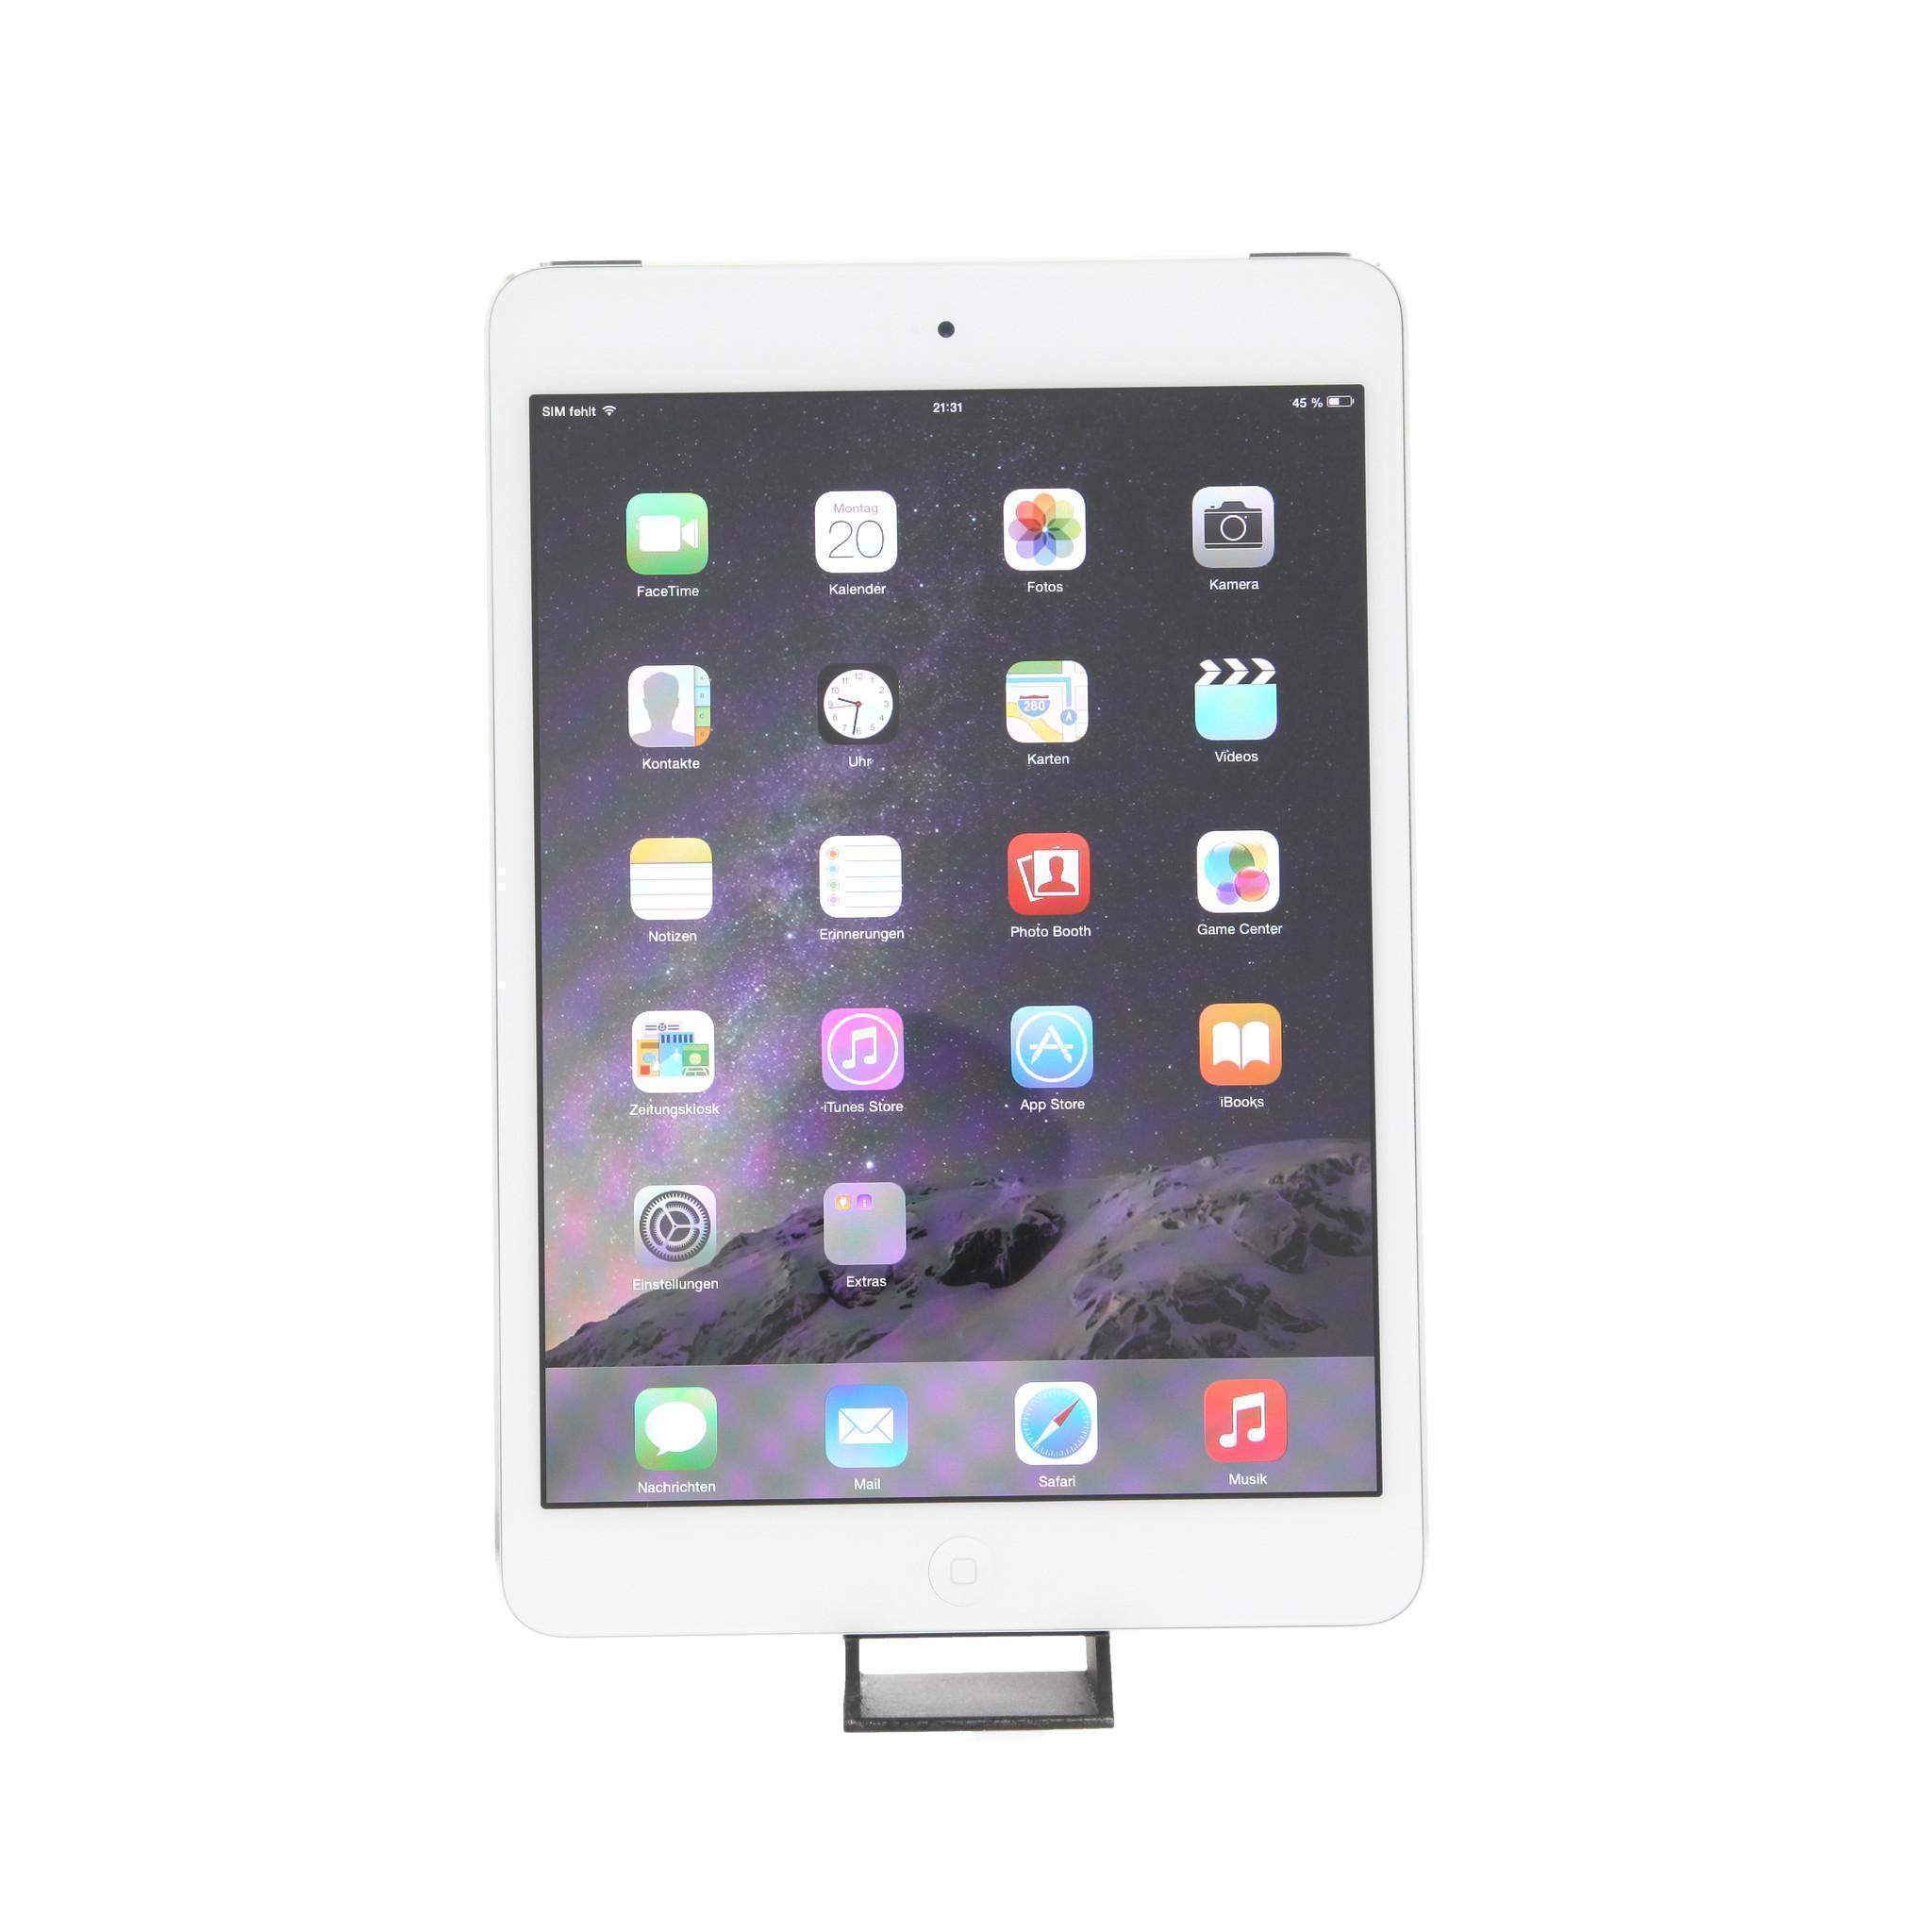 iPad mini 16GB - WLAN + LTE - Weiß - Ohne Vertrag